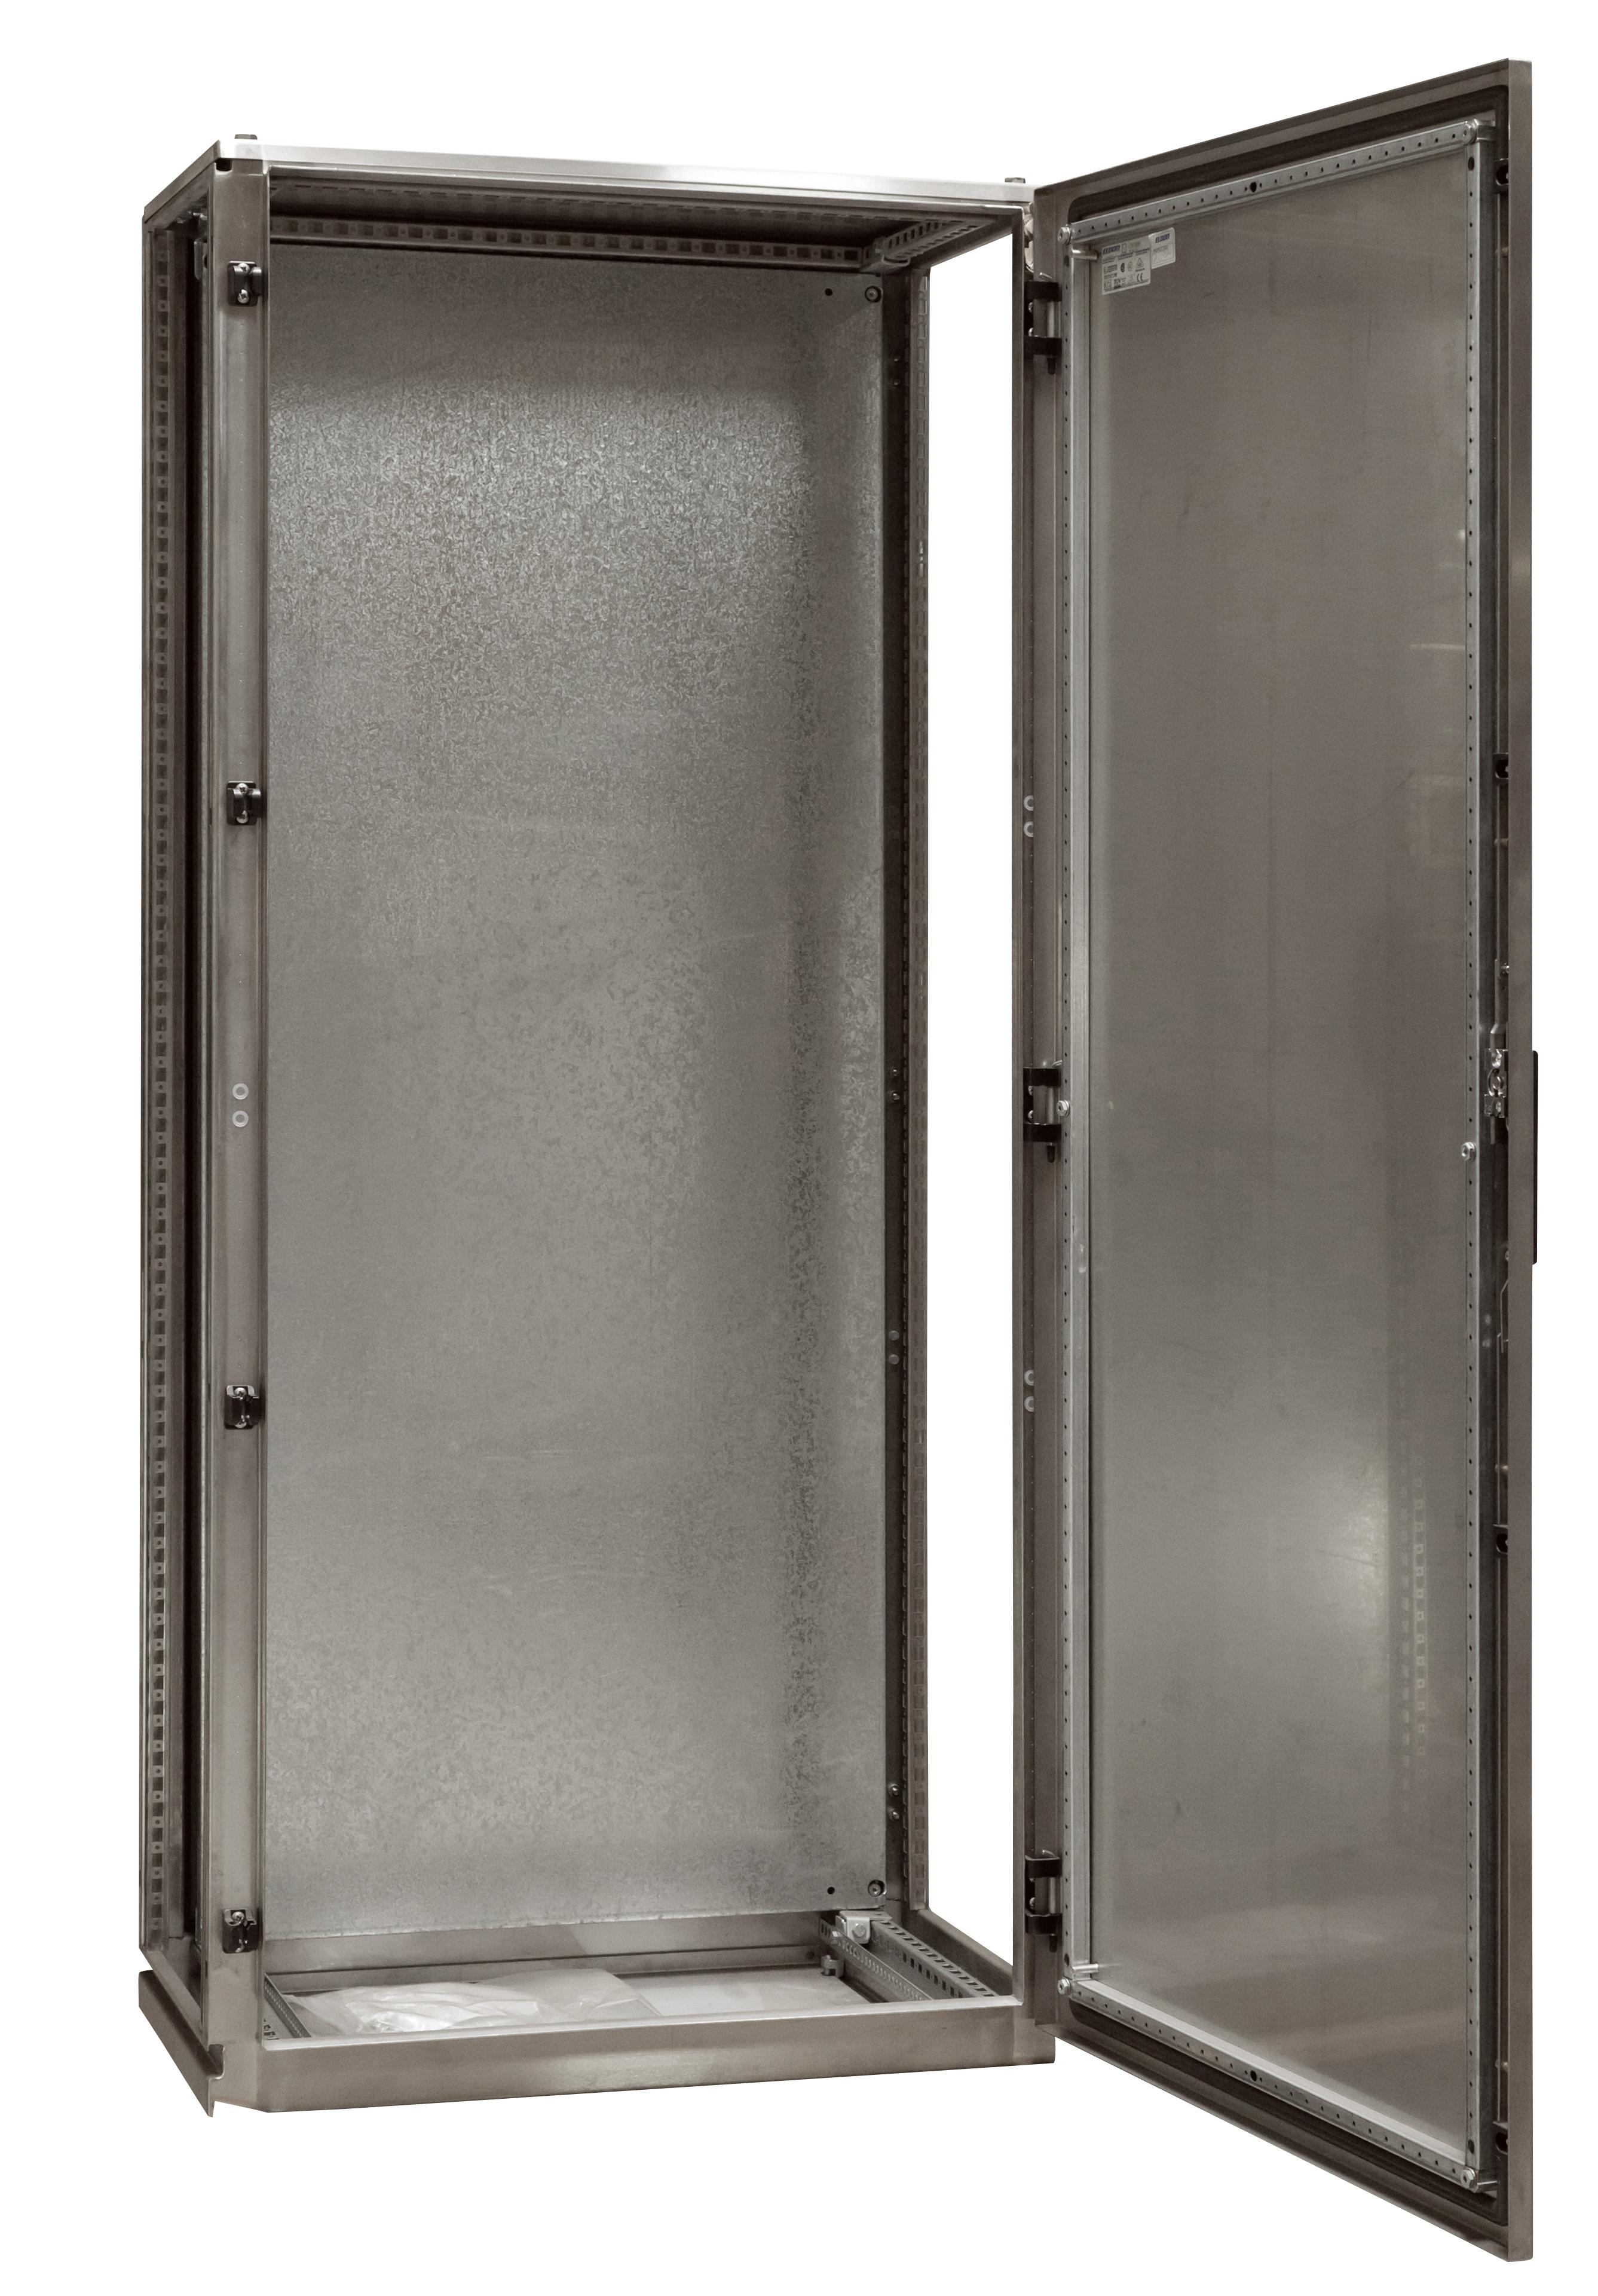 1 Stk Anreihschrank Edelstahl 1-türig, 2000x600x600mm, AISI 304L ASR206060-